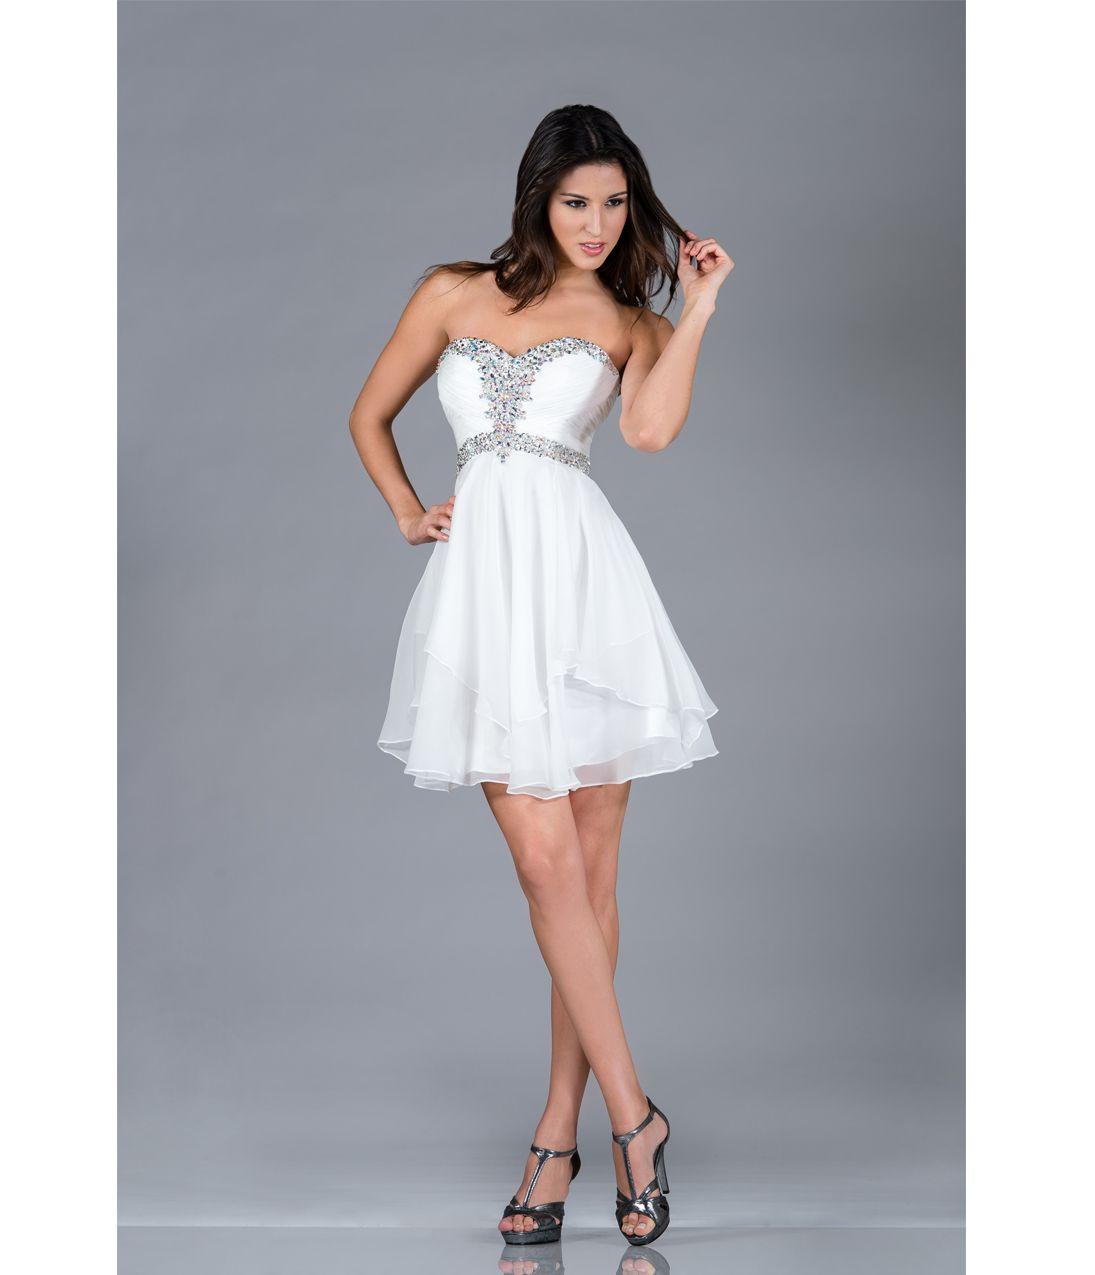 Off-White Strapless Short Chiffon Prom Dress | 8th grade dresses ...